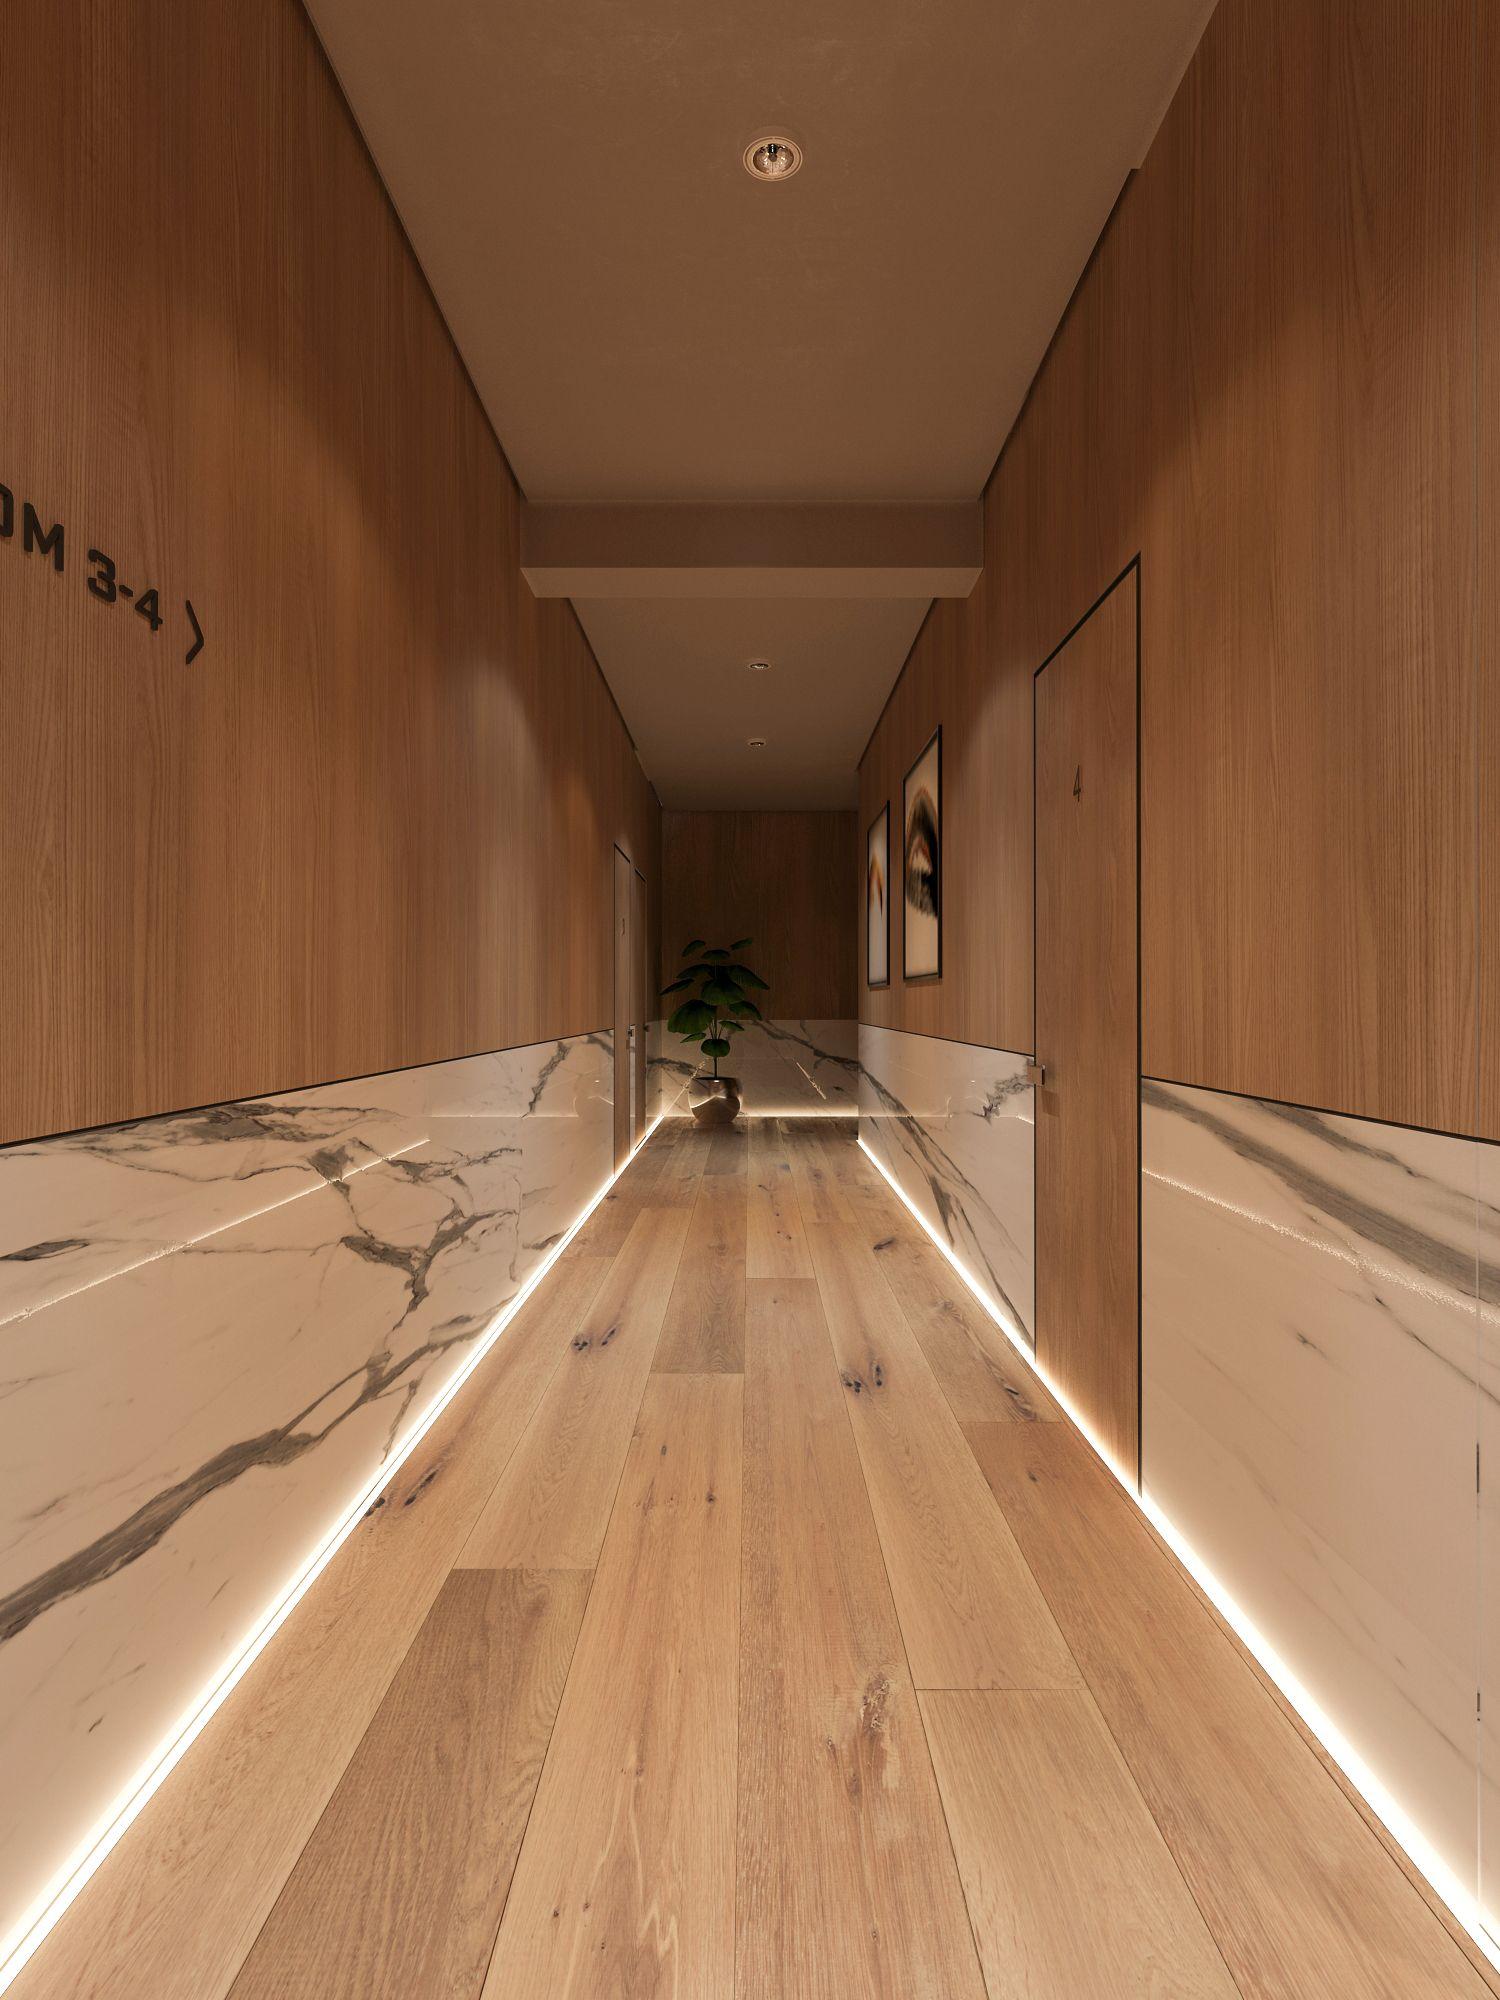 mini hotel interiors pinterest design hotel modernes design und indirekte beleuchtung. Black Bedroom Furniture Sets. Home Design Ideas